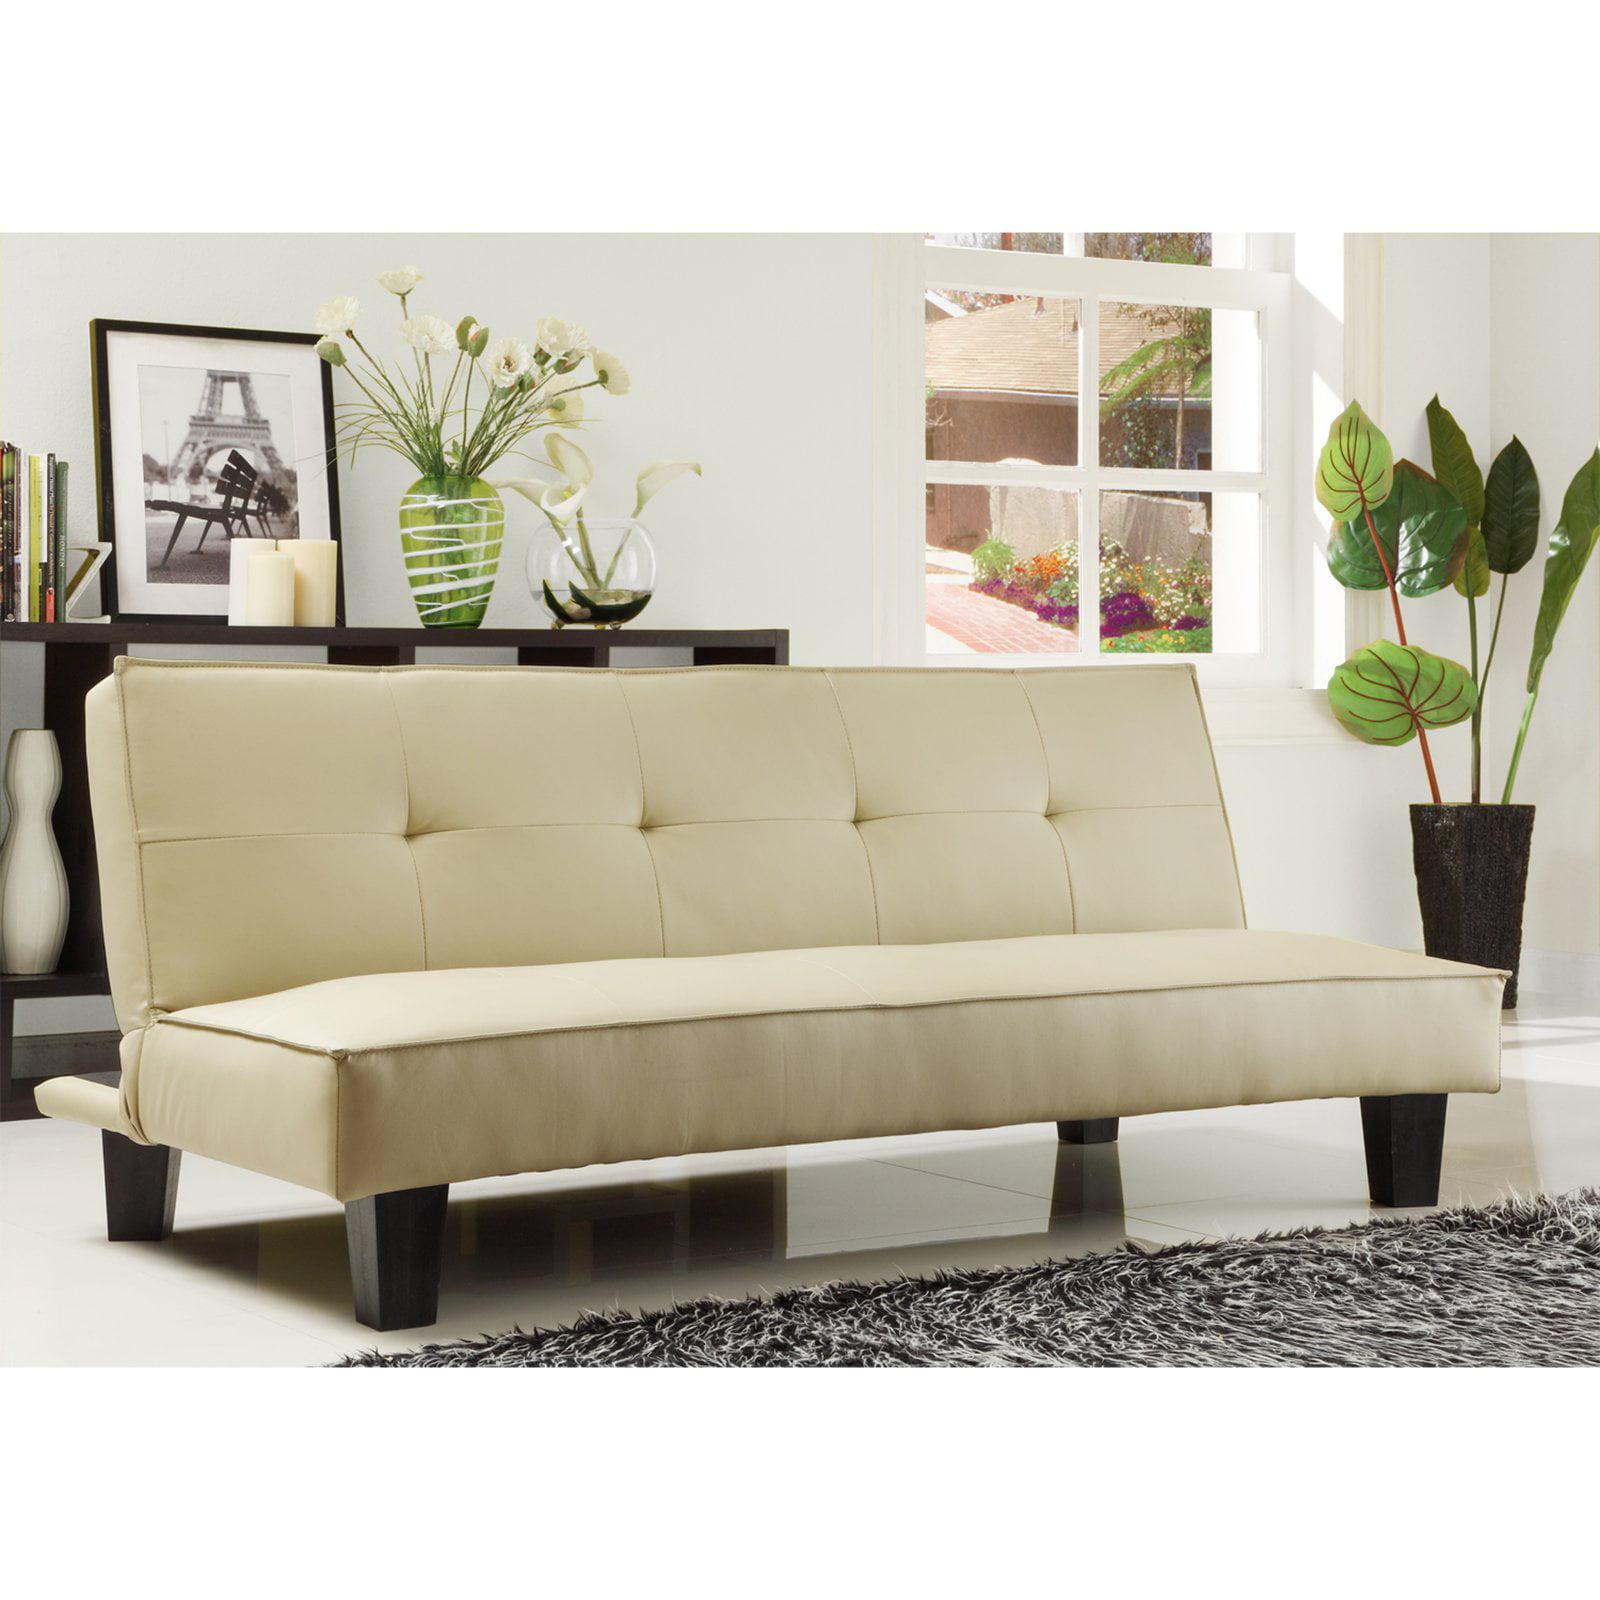 Chelsea Lane Tufted Mini Sofa Bed Lounger Walmart